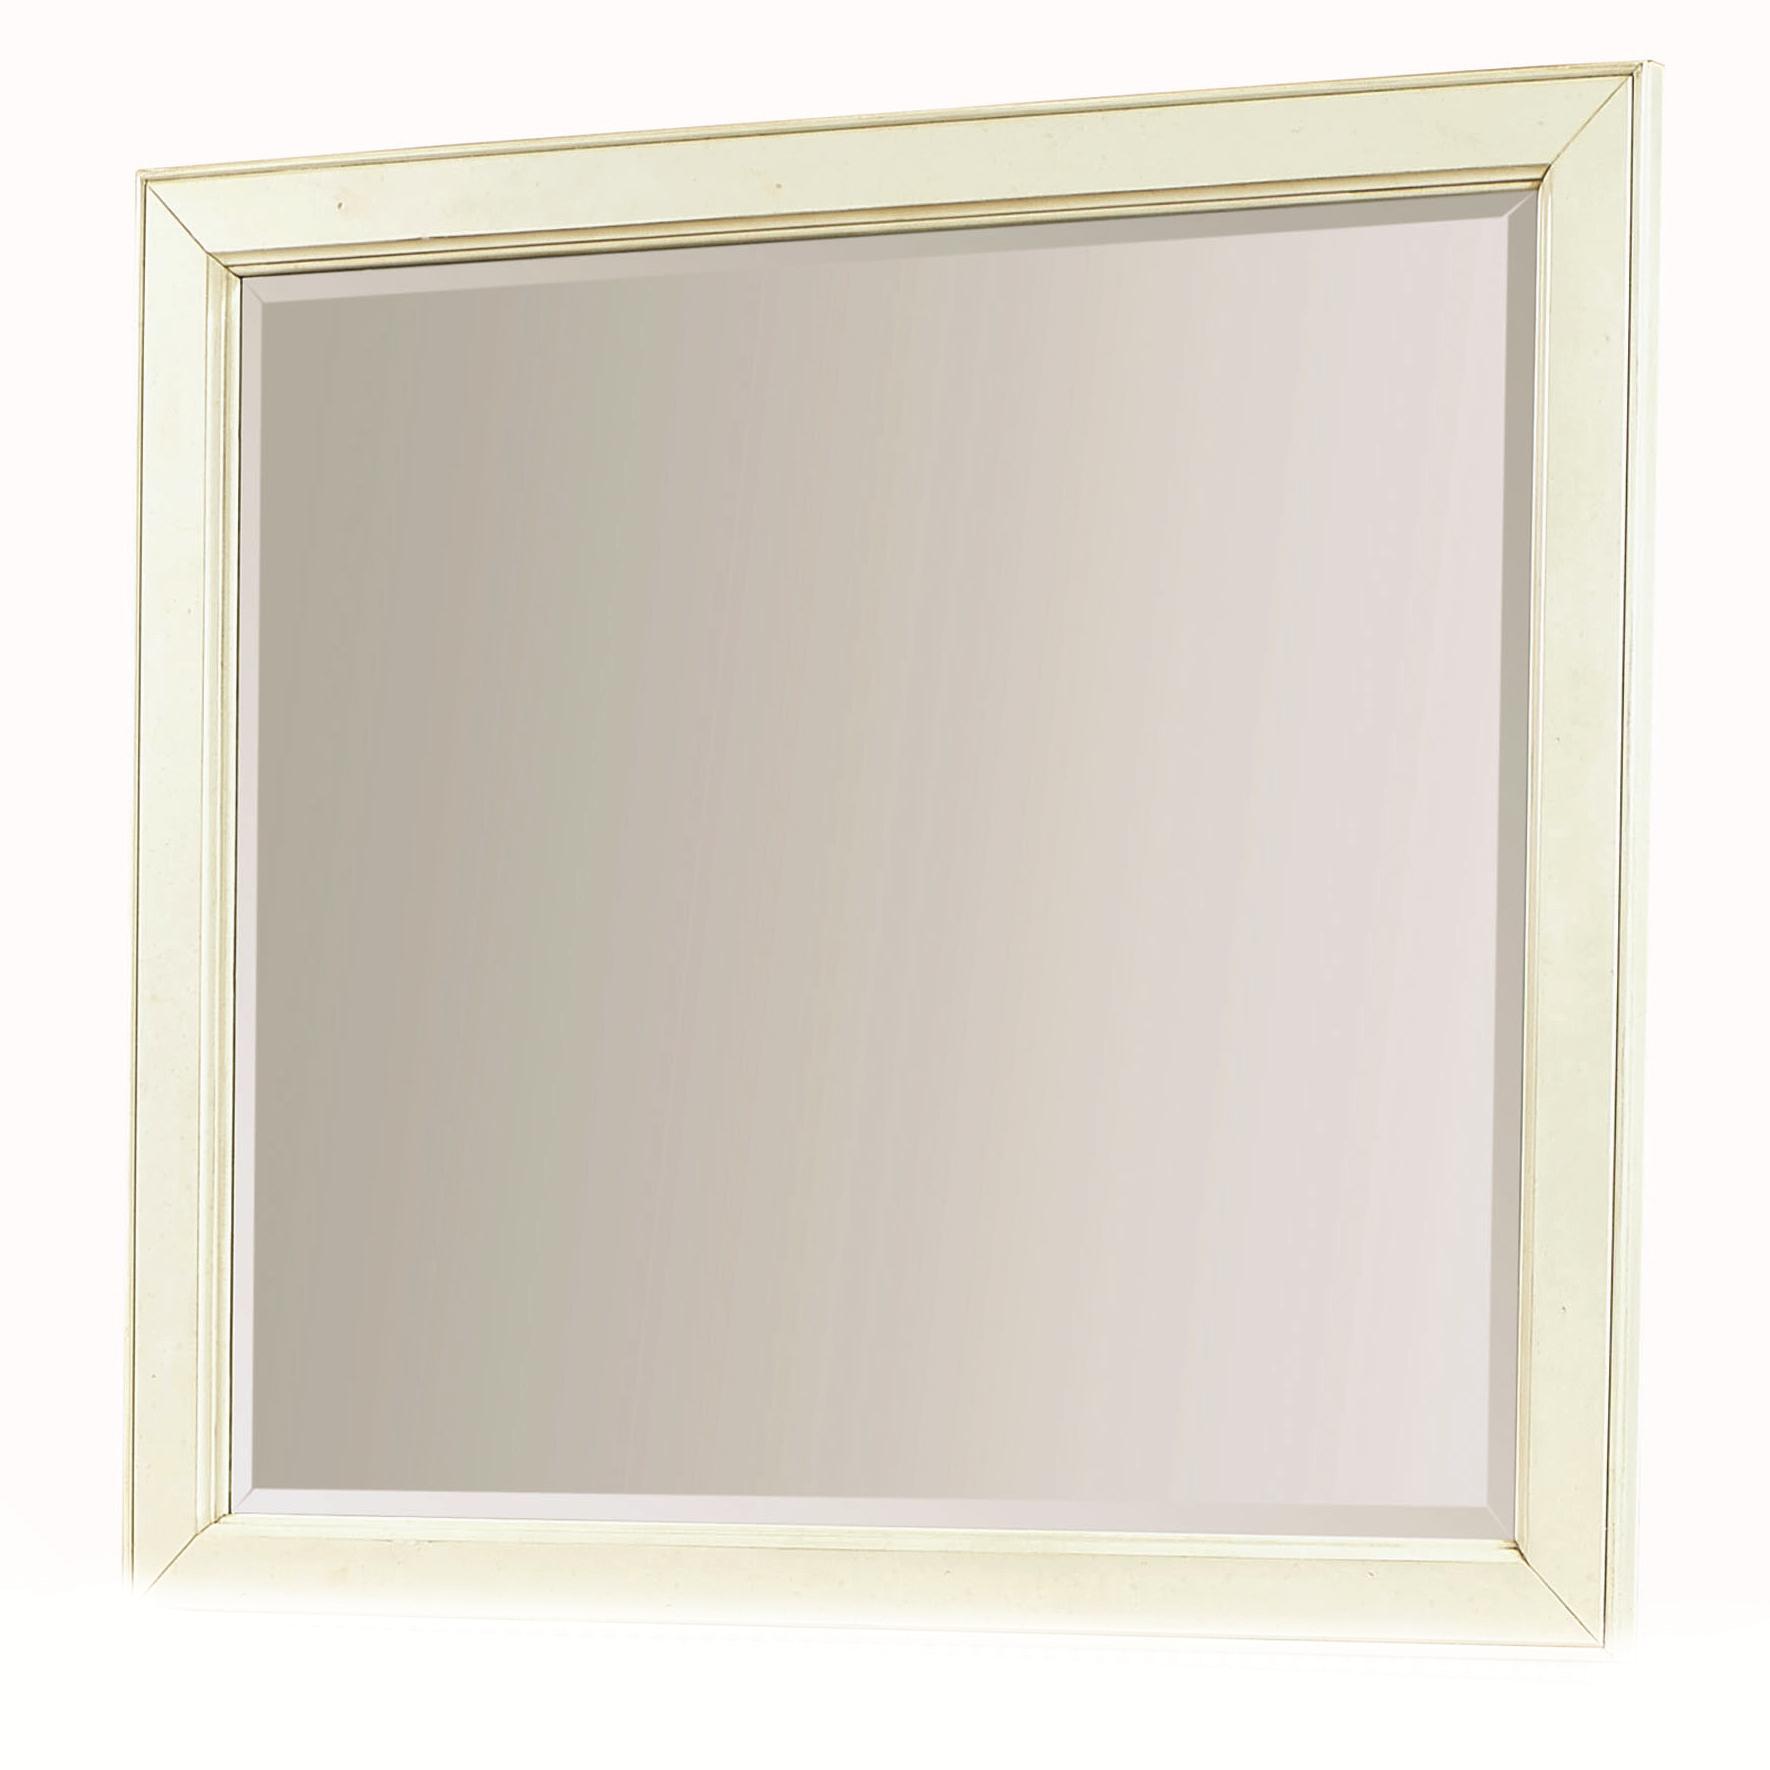 Aspenhome Cottonwood Dresser Mirror - Item Number: I67-462